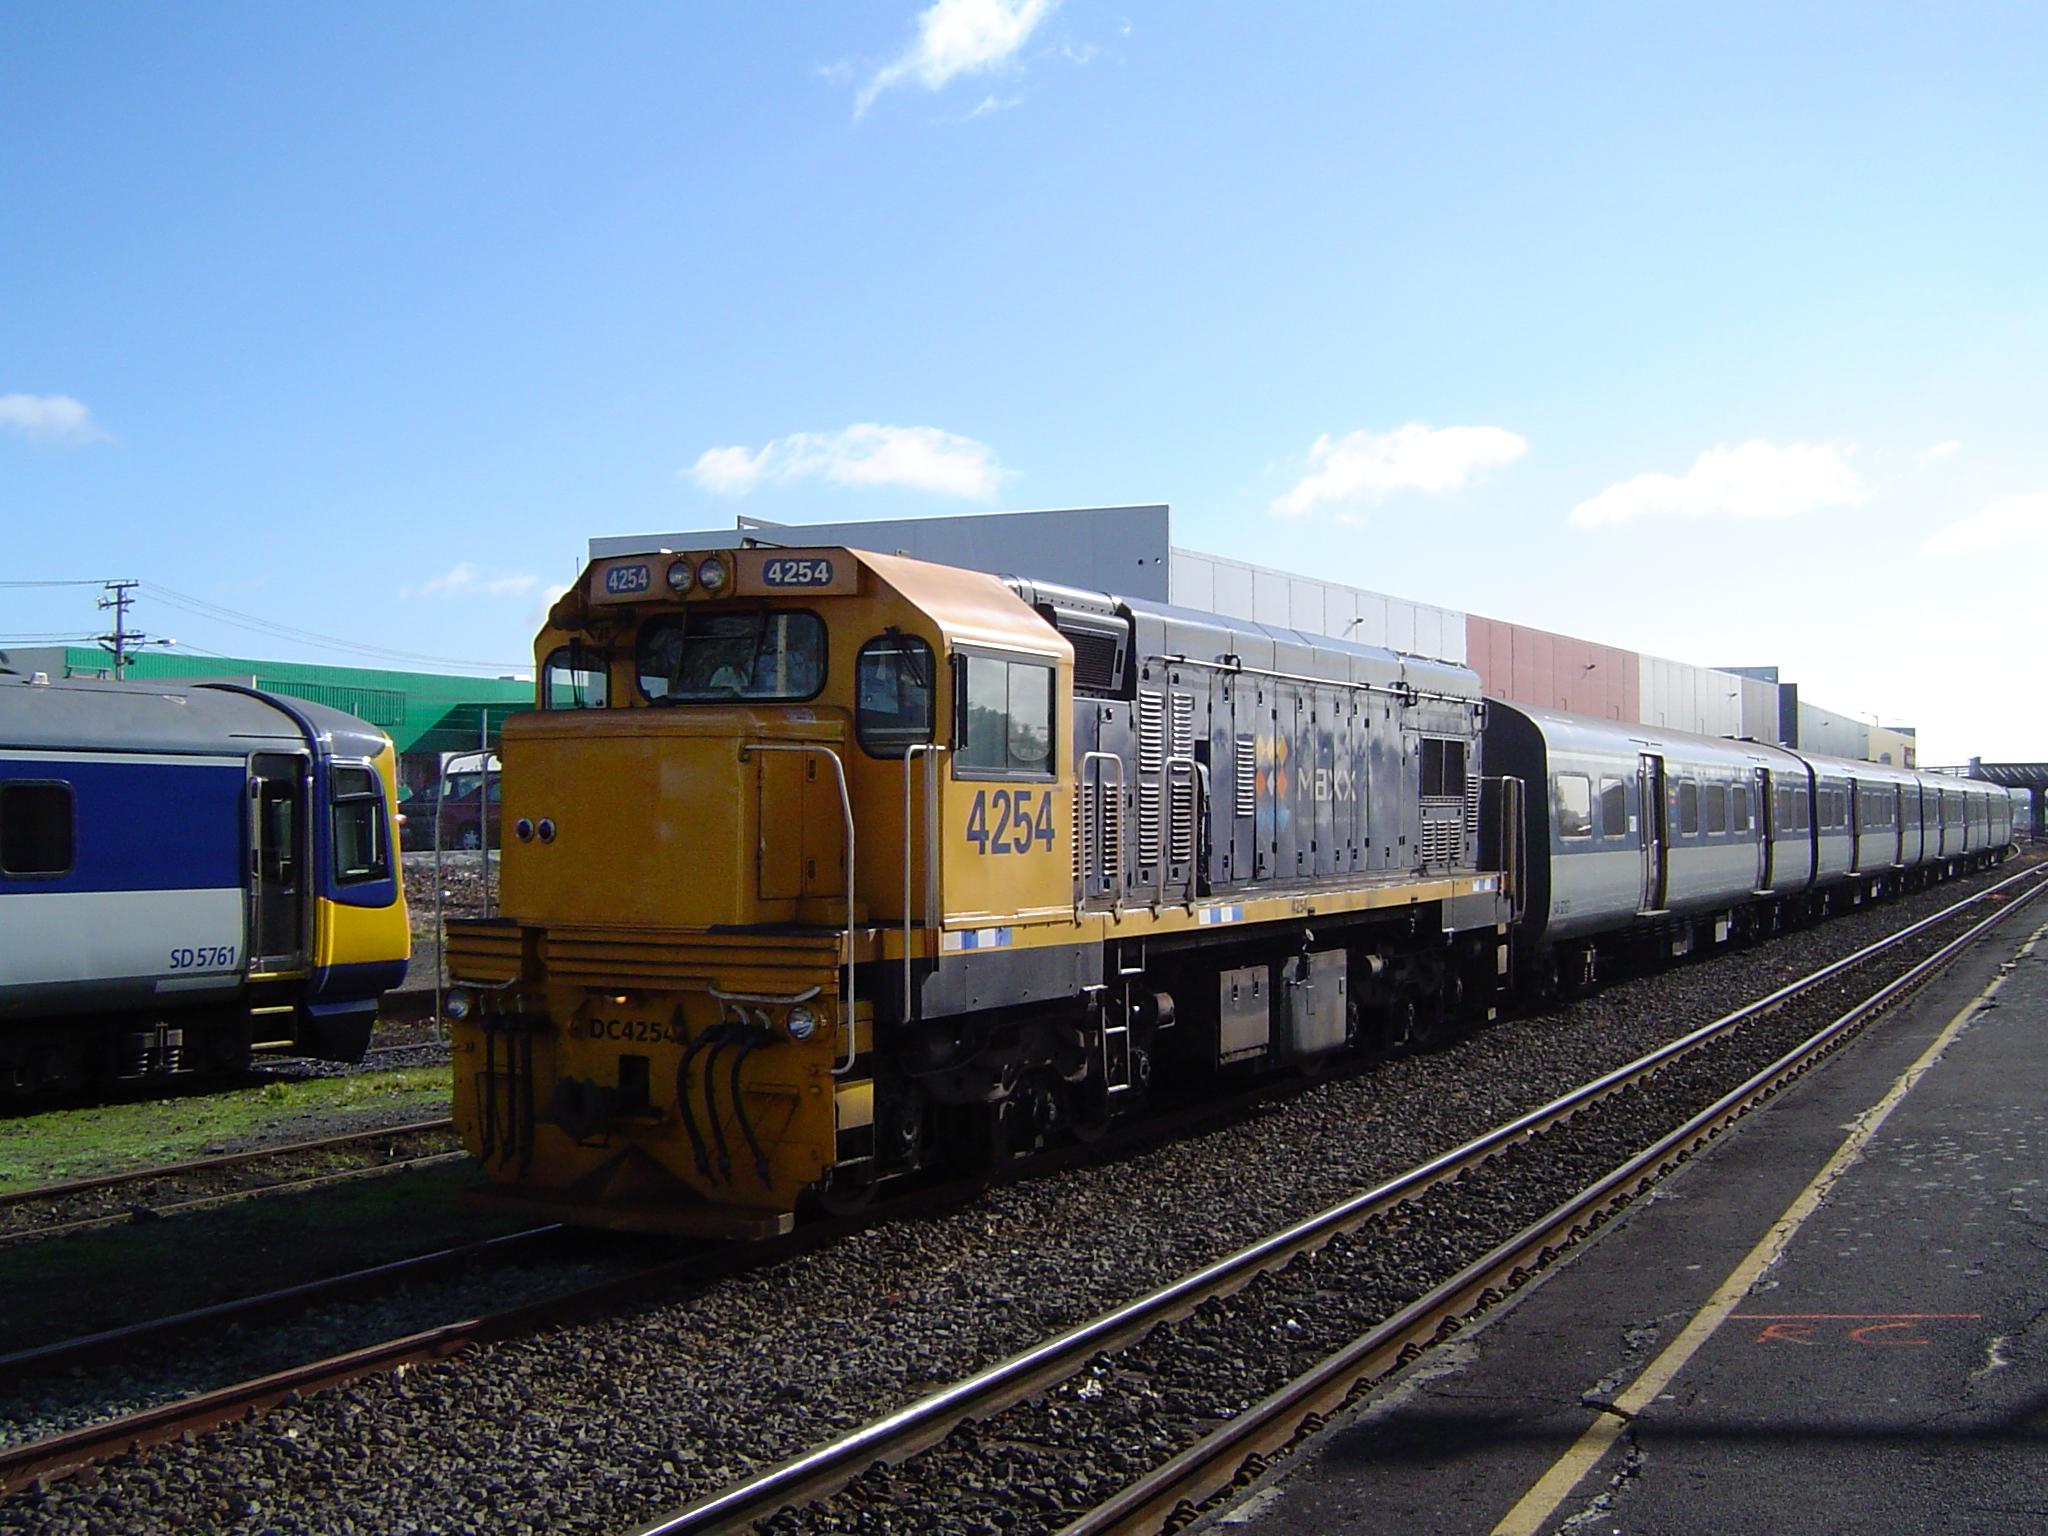 El juego de las imagenes-http://www.trainspotted.com/content/ARTA/42/ARTA-4254-LD-LF-20050630-636.jpg